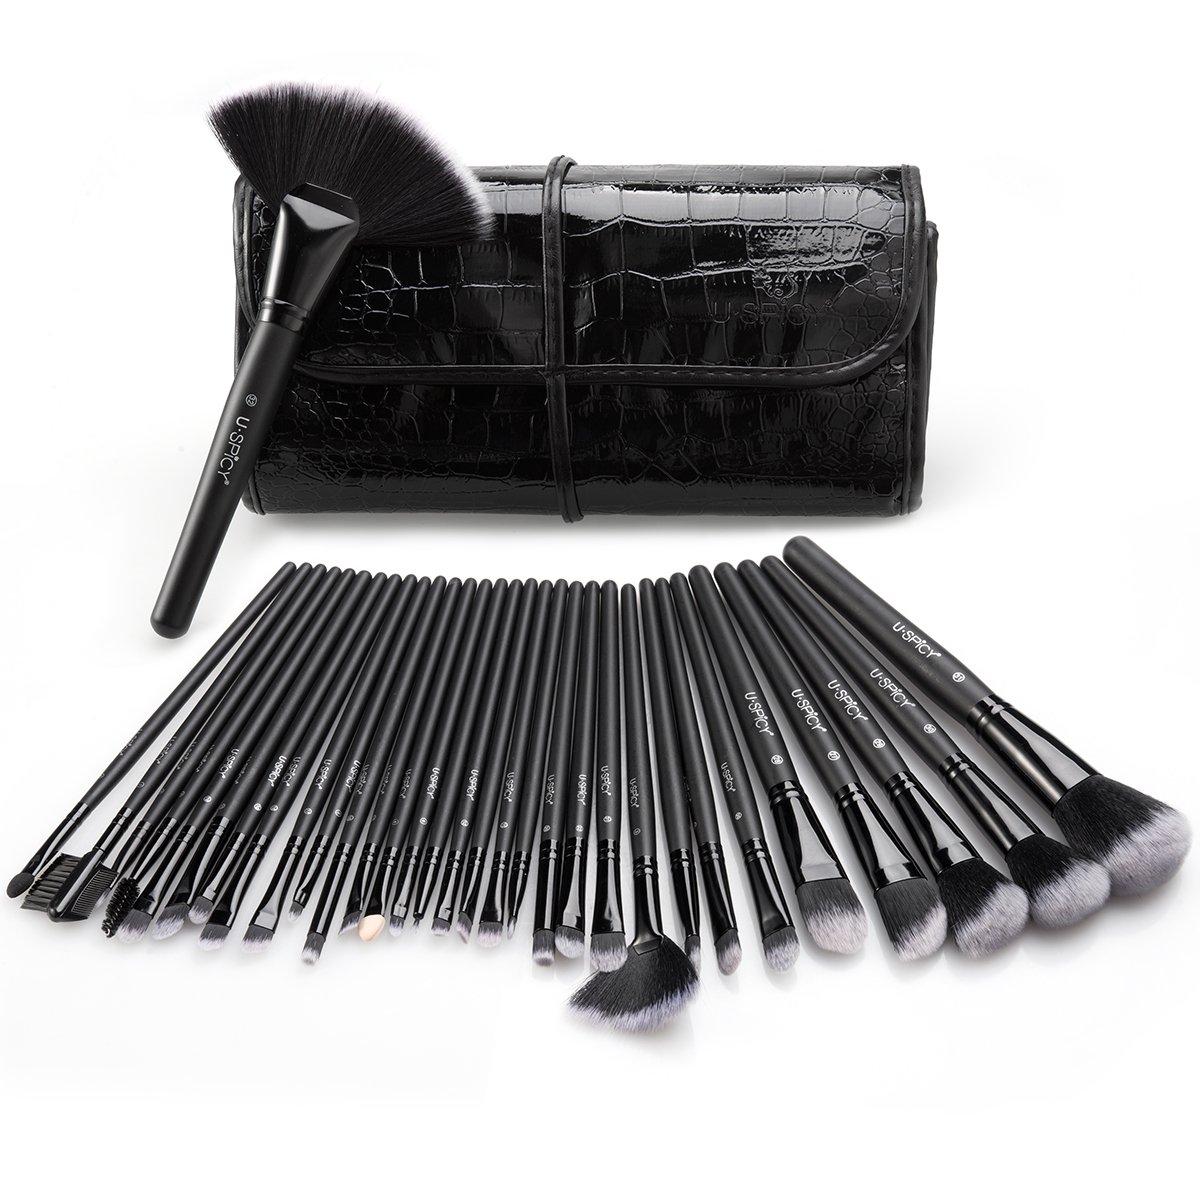 Makeup Brush Set, USpicy 32 Pieces Premium Professional Makeup Brushes Essential Cosmetics With Case, Face Eye Shadow Eyeliner Foundation Blush Lip Powder Liquid Cream Blending Brush-Black